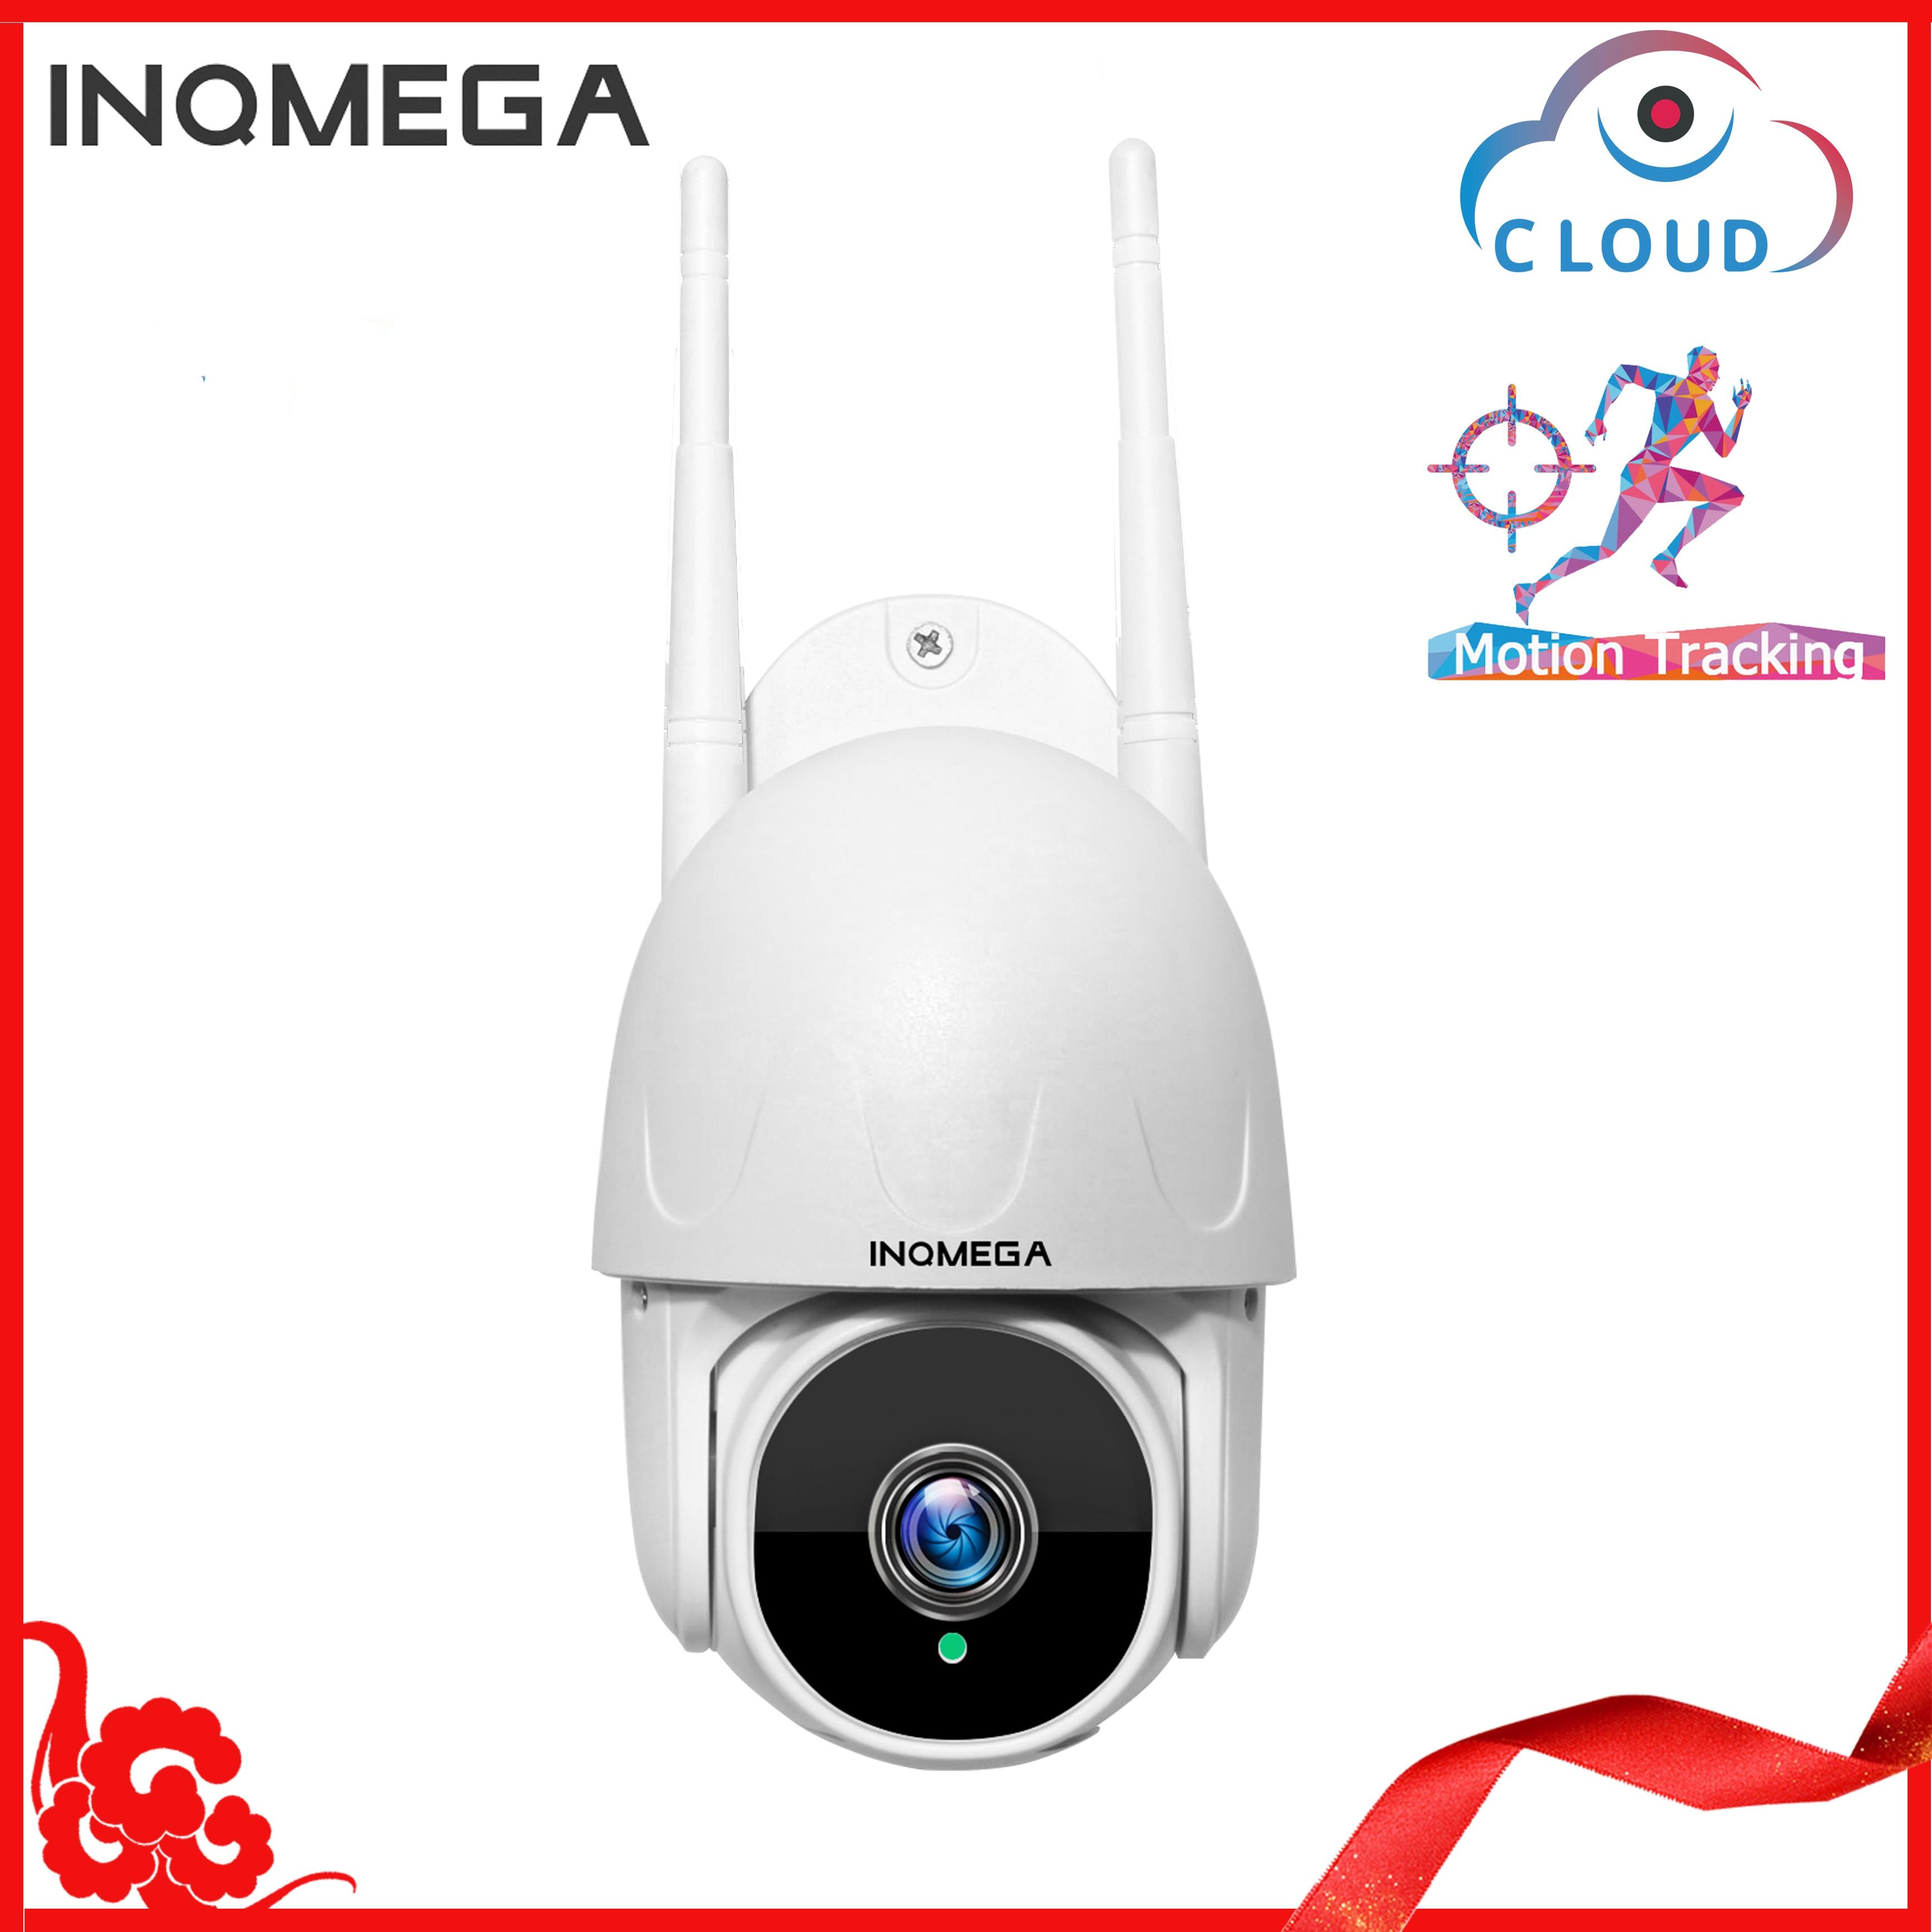 INQMEGA Cloud 1080P PTZ Speed Dome Wifi Camera Outdoor 2MP Auto-Tracking Camera ONVIF Wireless Camera Home Surveillance IP Cam